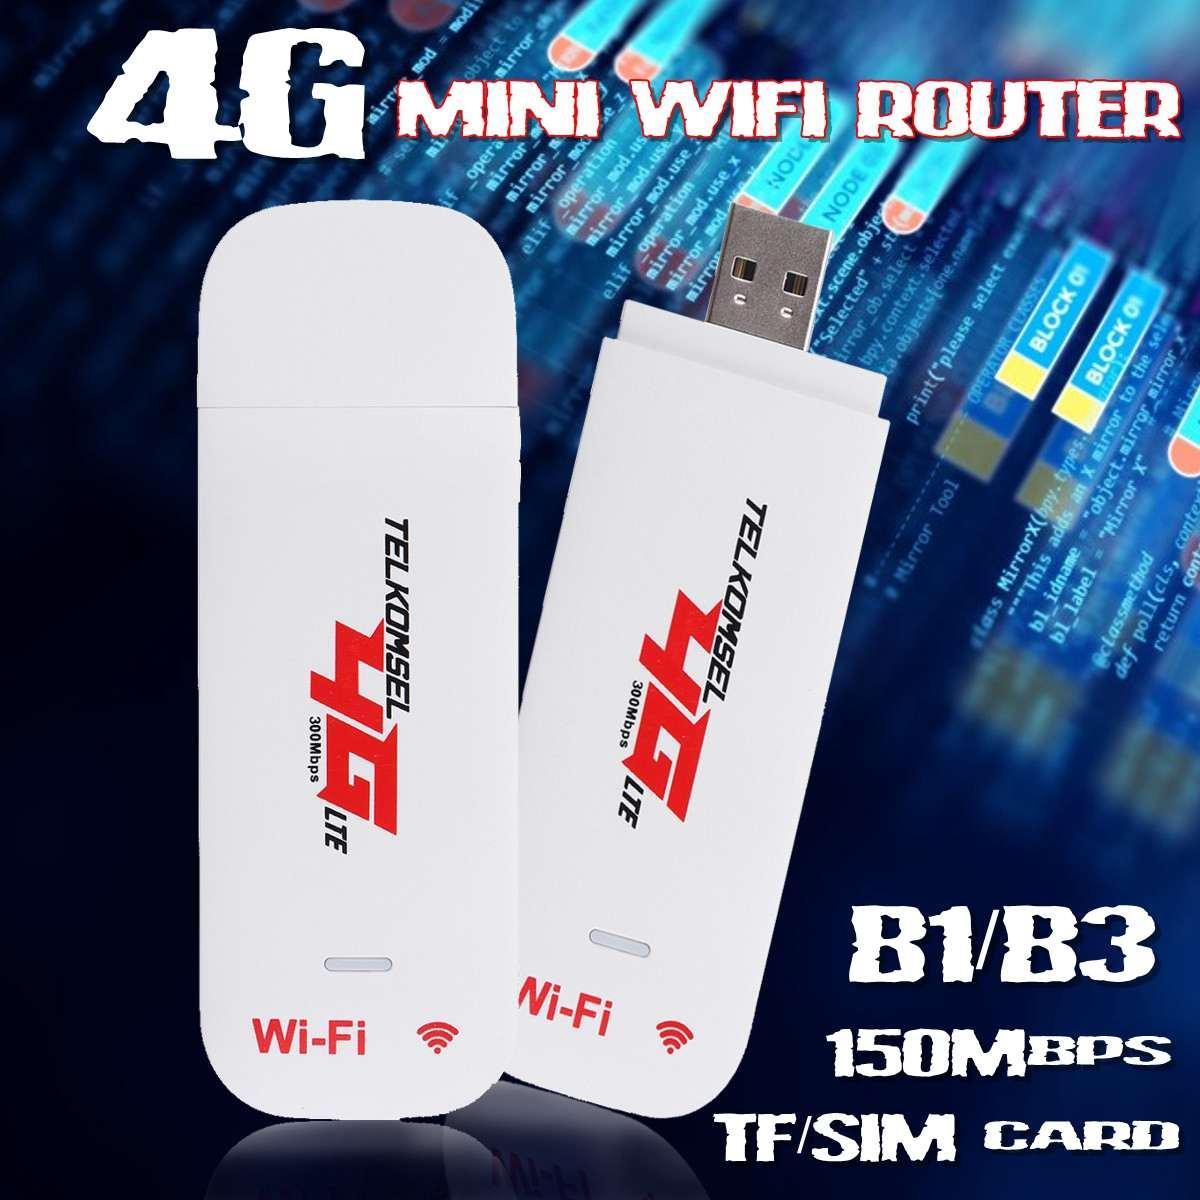 4g 3g Lte Usb 2.0 Wireless Hotspot Mobile Dongle Router Mit Sim Tf Karte Slot Für Handy Tablet